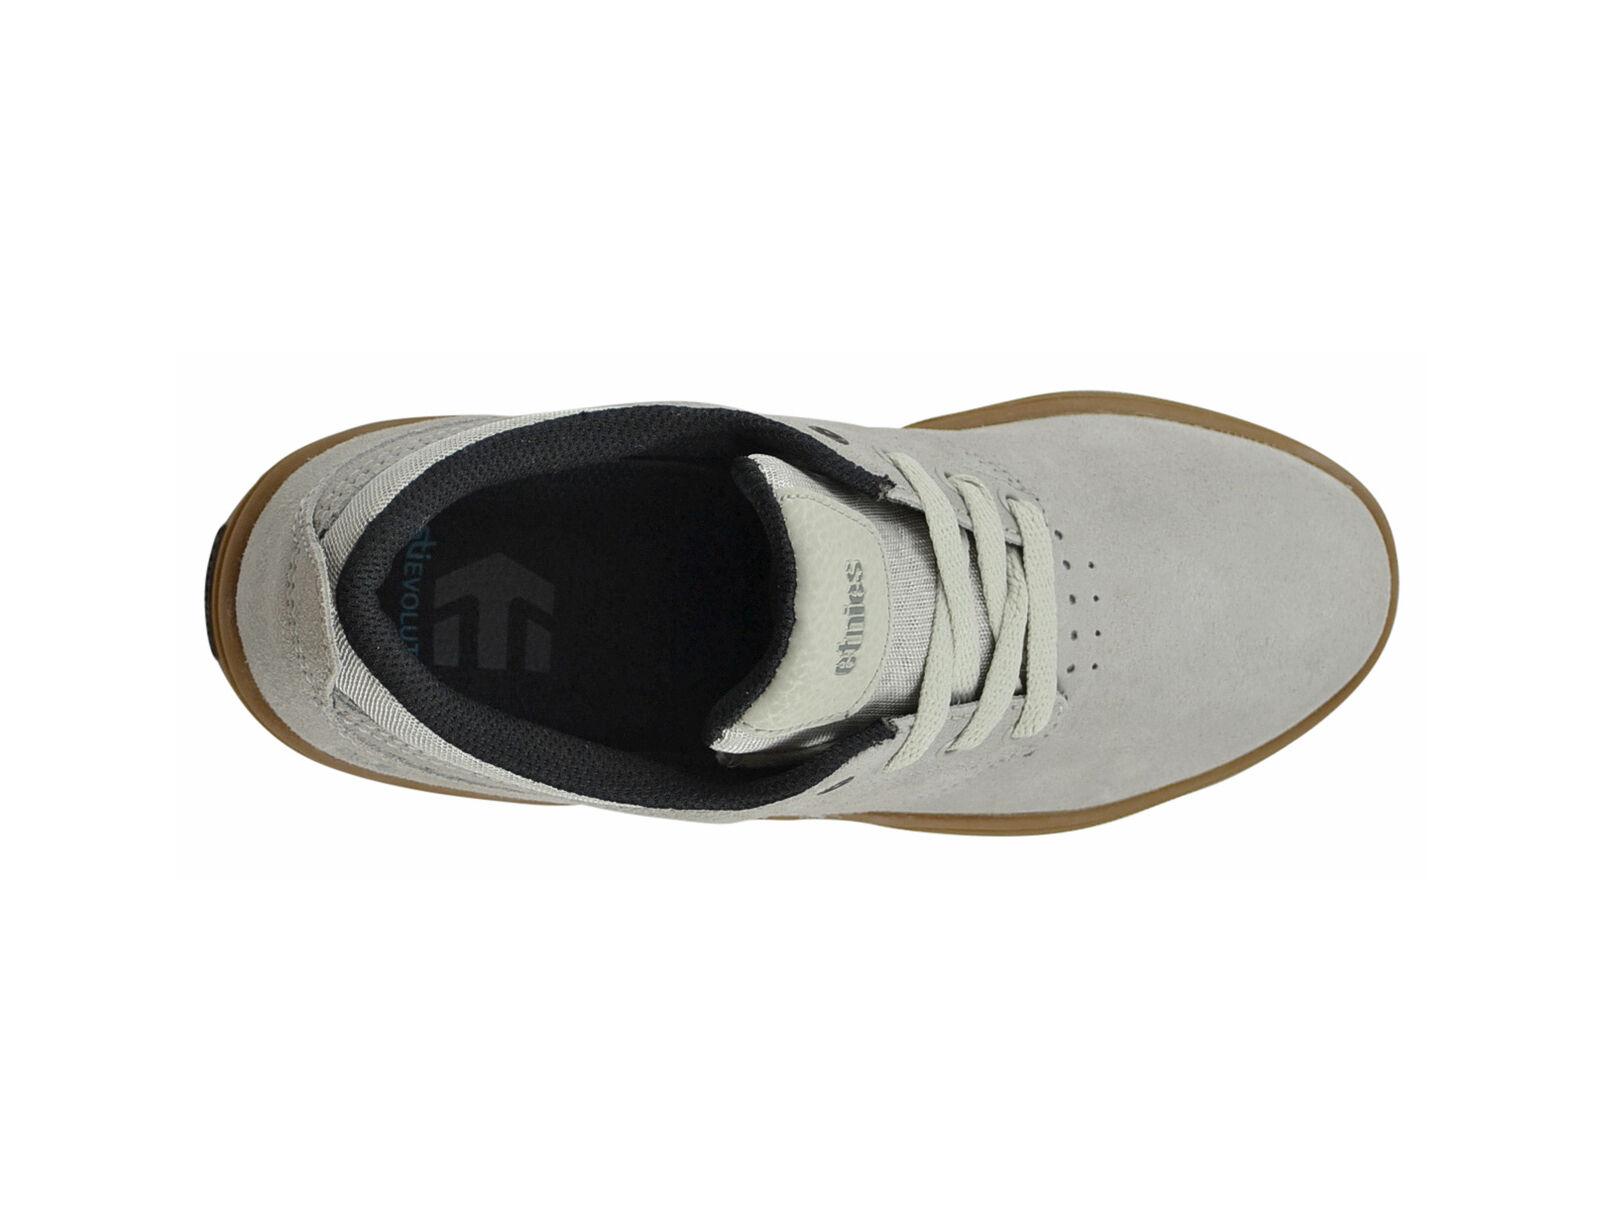 Etnies Jameson MT Weiß gum gum gum Skater Turnschuhe Schuhe weiß 032be0